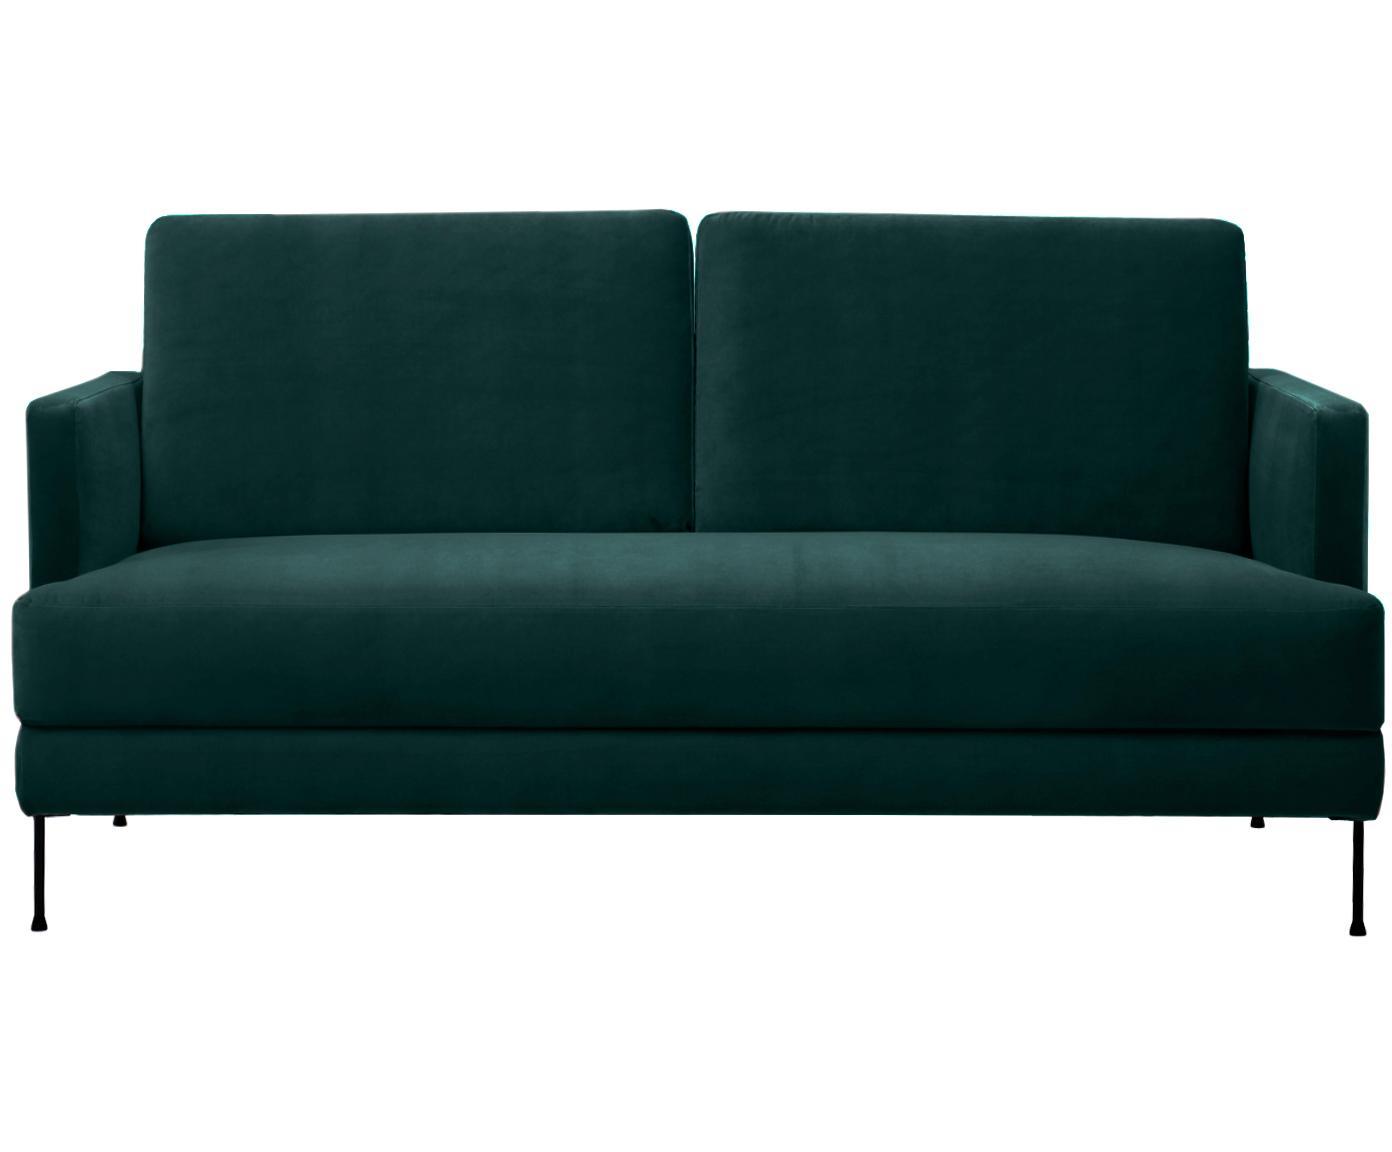 Samt-Sofa Fluente (2-Sitzer), Bezug: Samt (Polyester) 100.000 , Gestell: Massives Kiefernholz, Samt Dunkelgrün, B 168 x T 83 cm